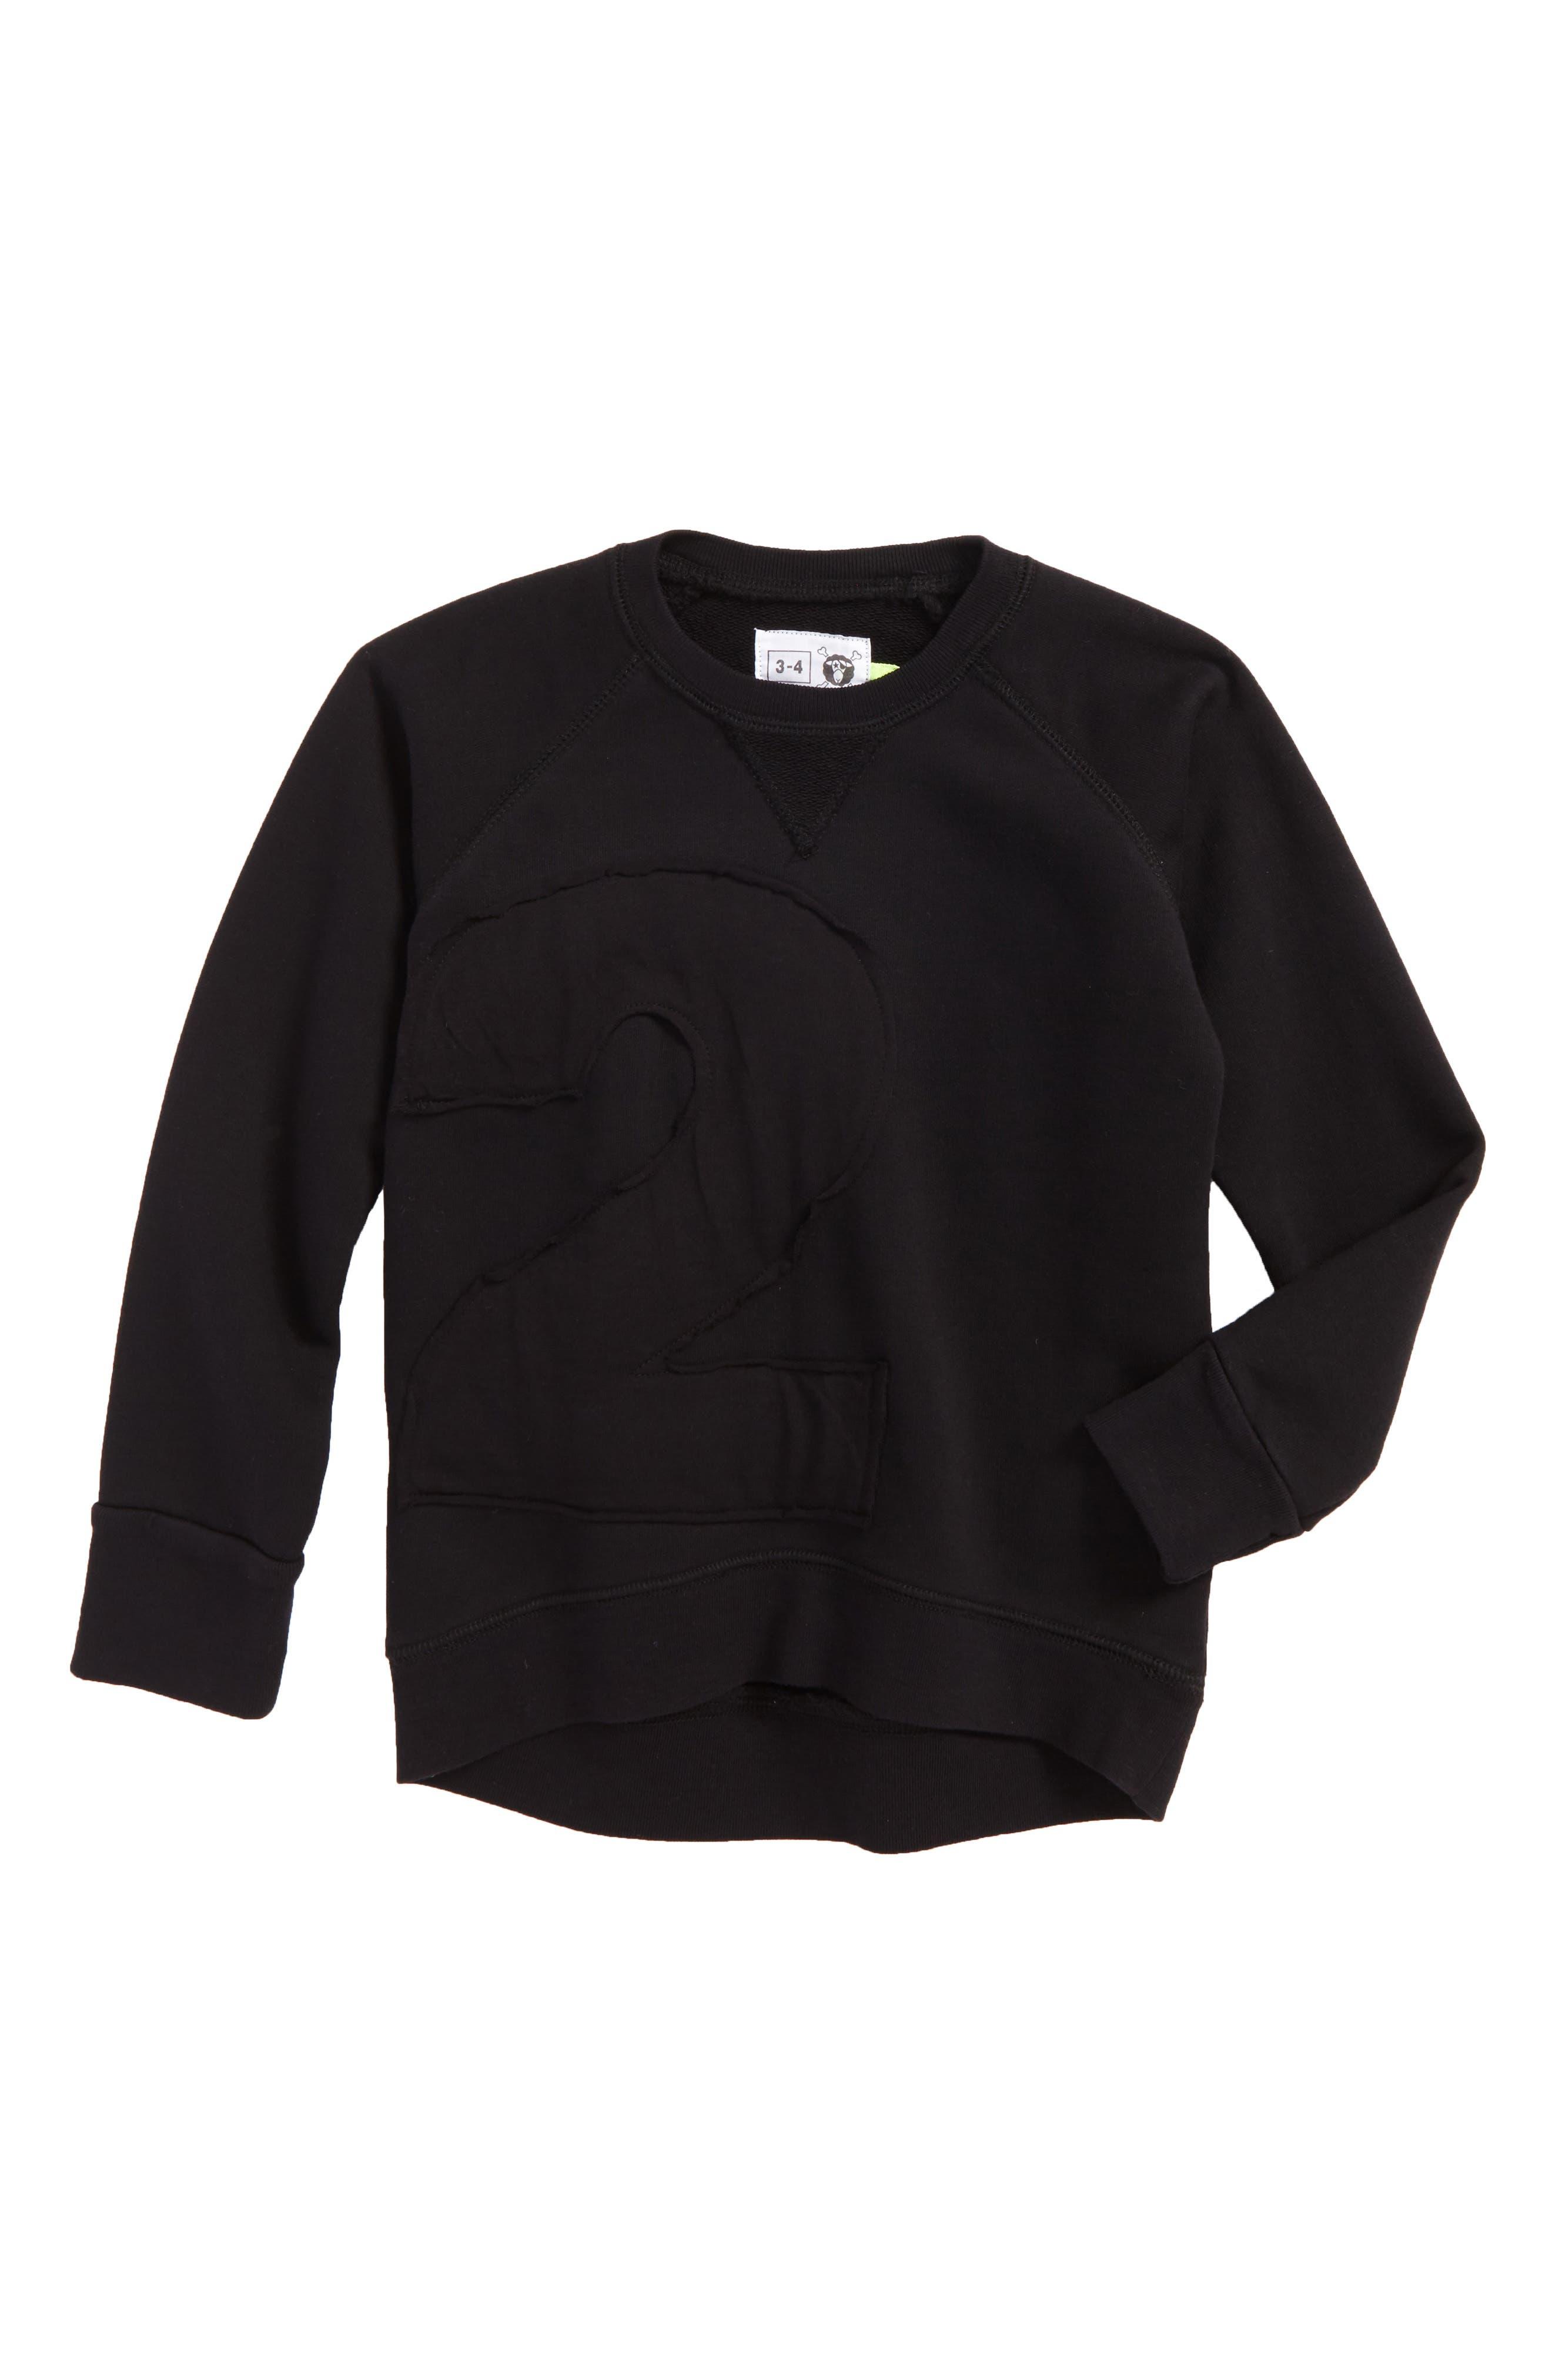 Puffy Number Sweatshirt,                         Main,                         color, 001